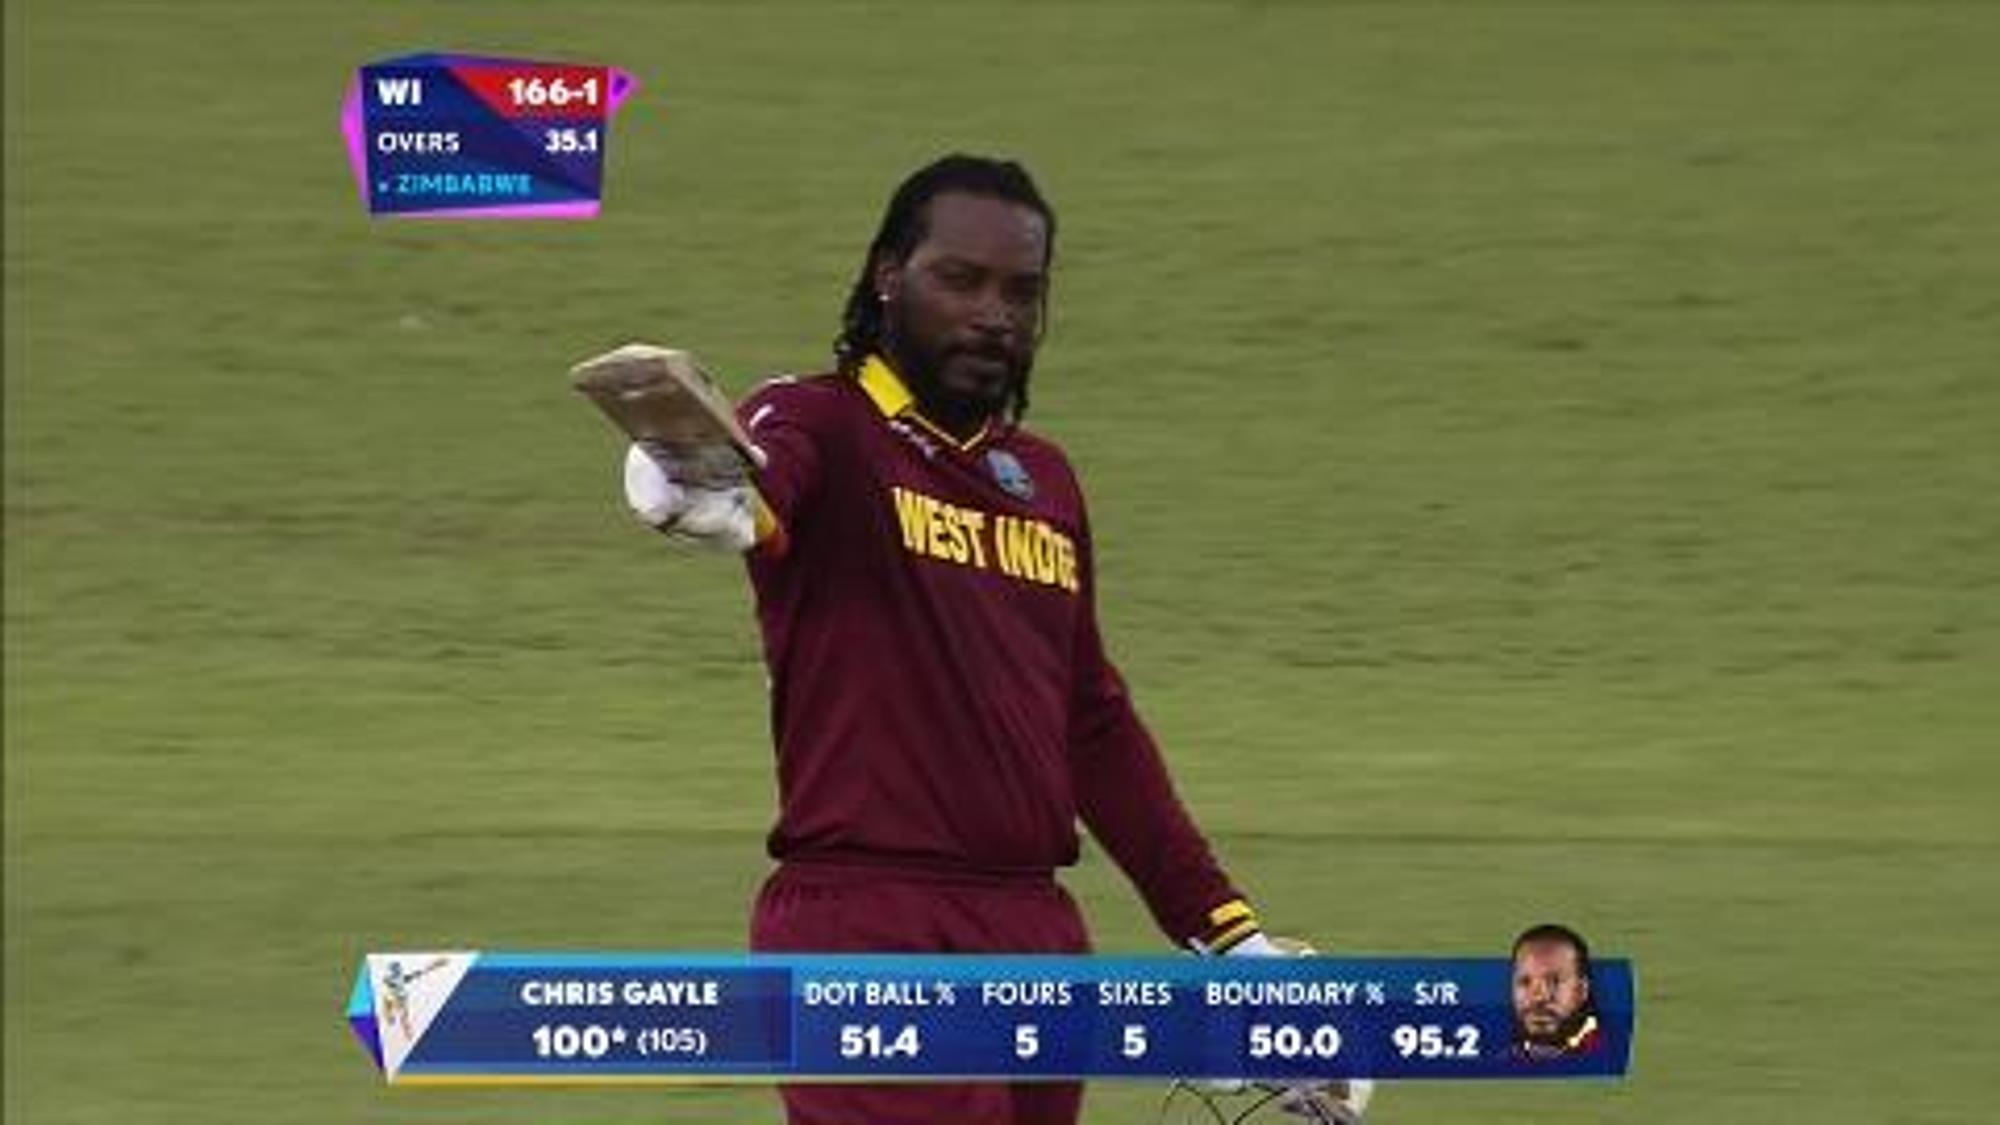 CWC15 WI vs ZIM - West Indies innings highlights